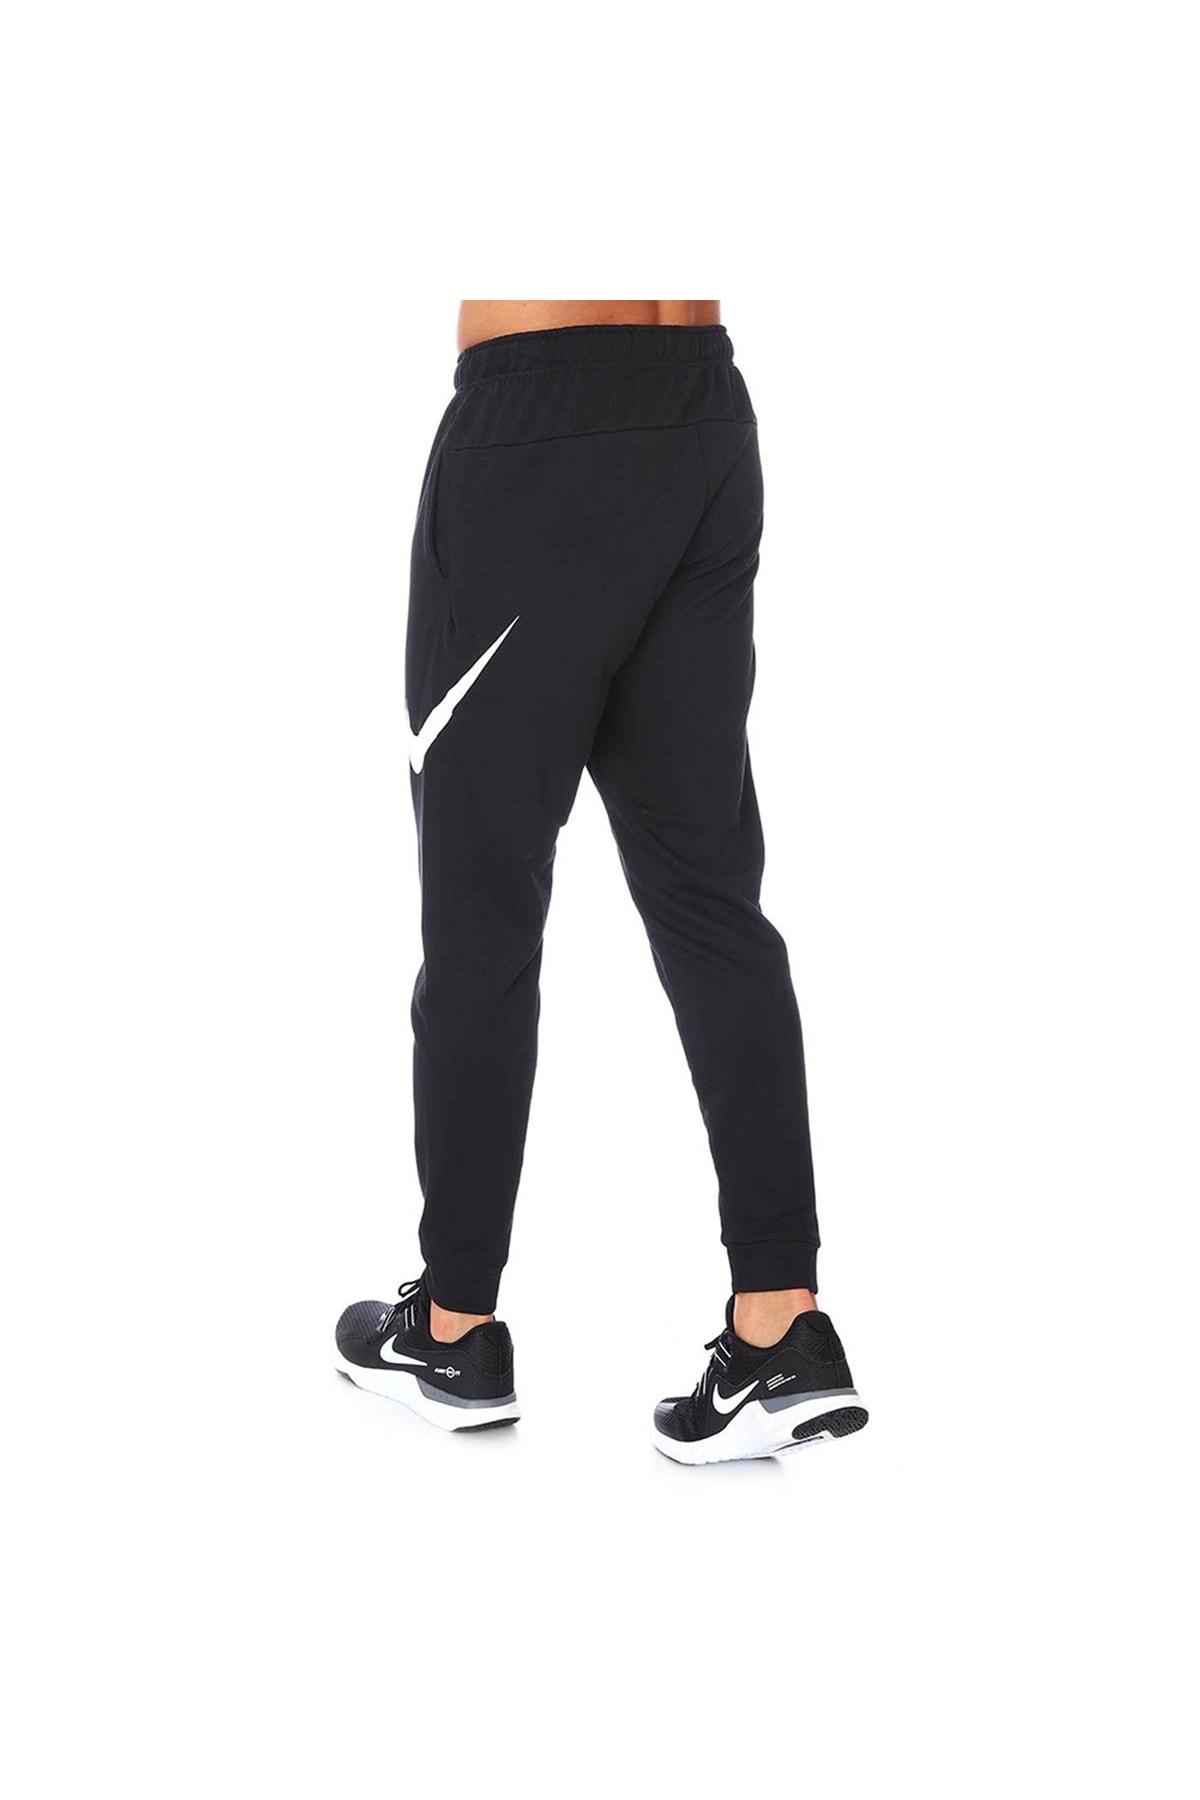 Nike Erkek  Dri-fıt Eşofman Altı